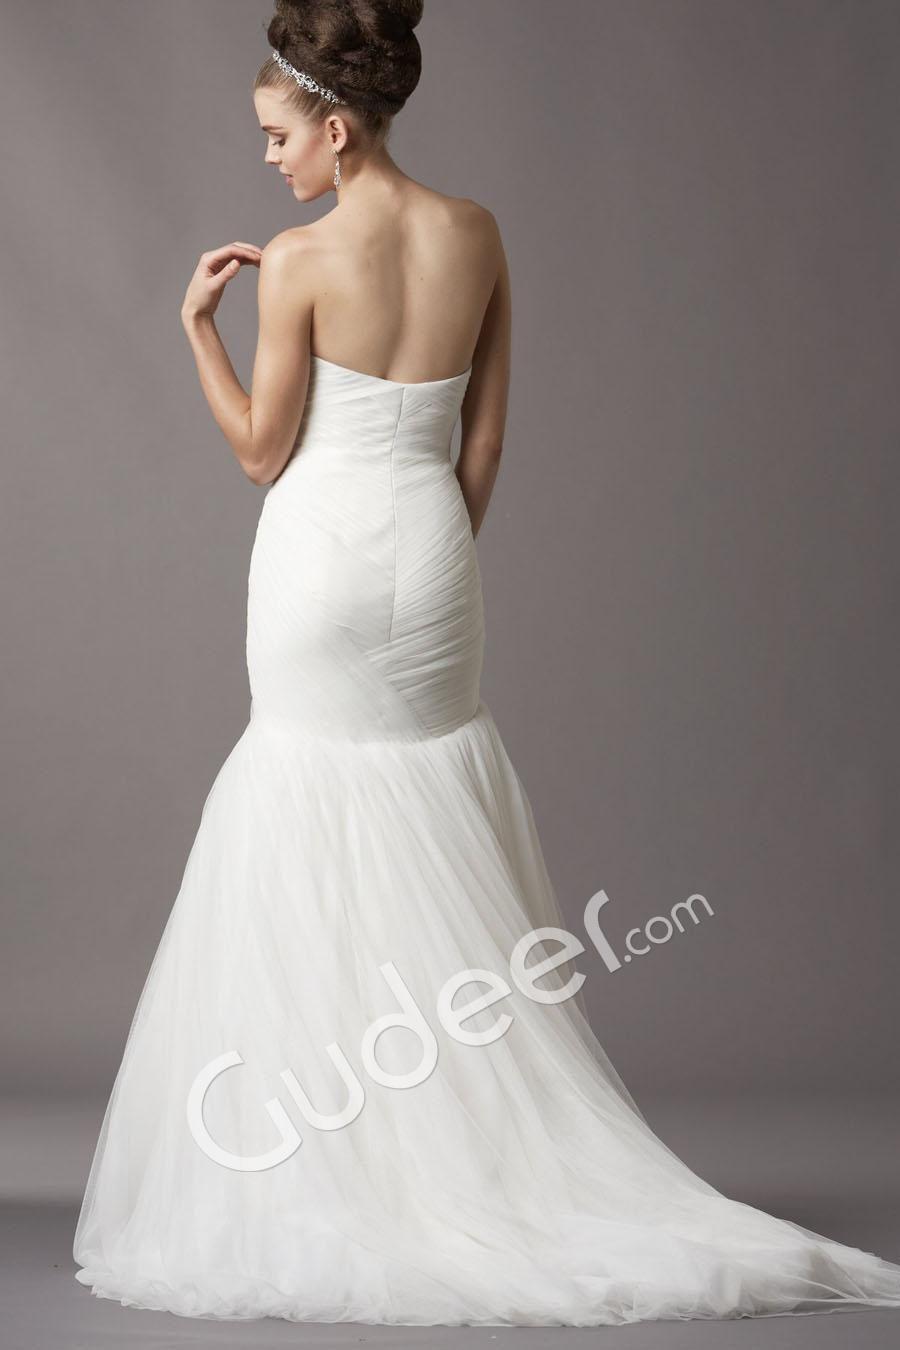 Soft Netting Mermaid Silhouette Strapless Shirred Skirt Wedding ...